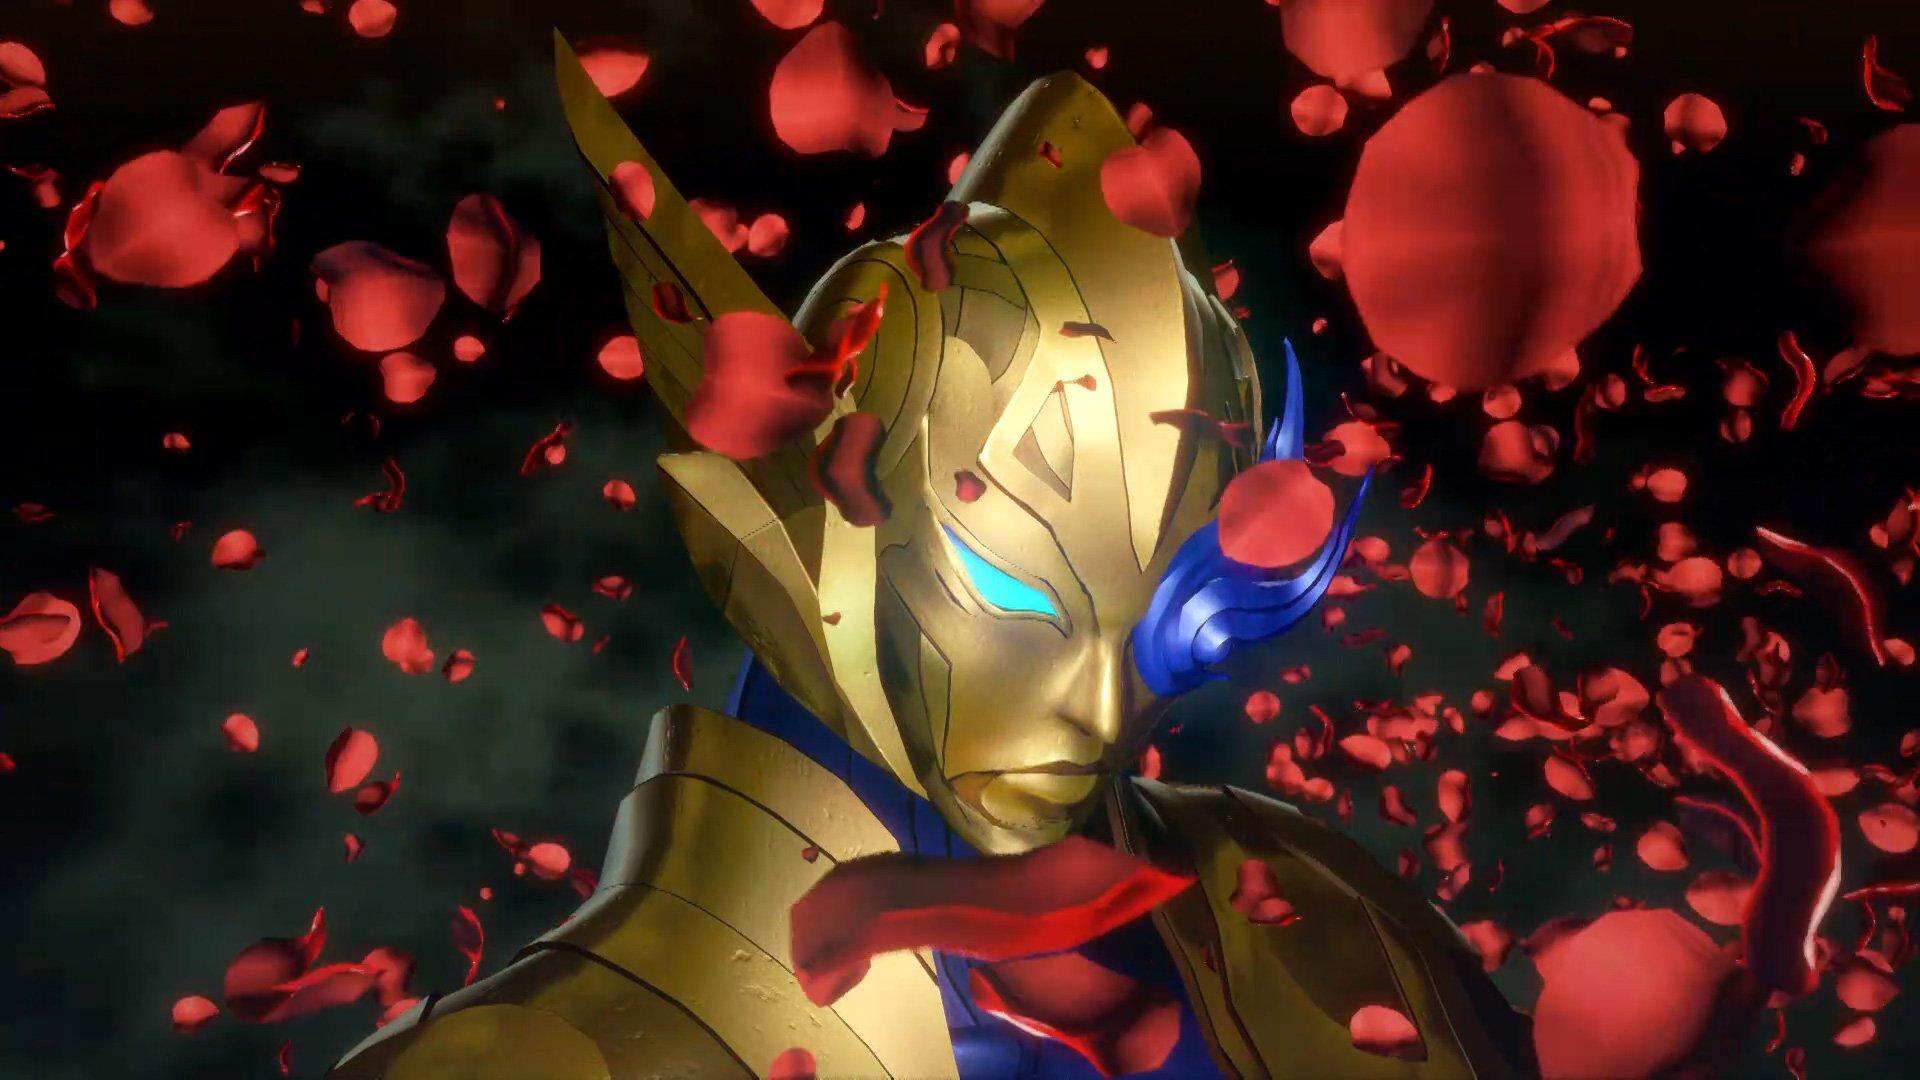 Утечка: В сети раньше времени появилась дата релиза Shin Megami Tensei V, игру представят на Nintendo Direct E3 4